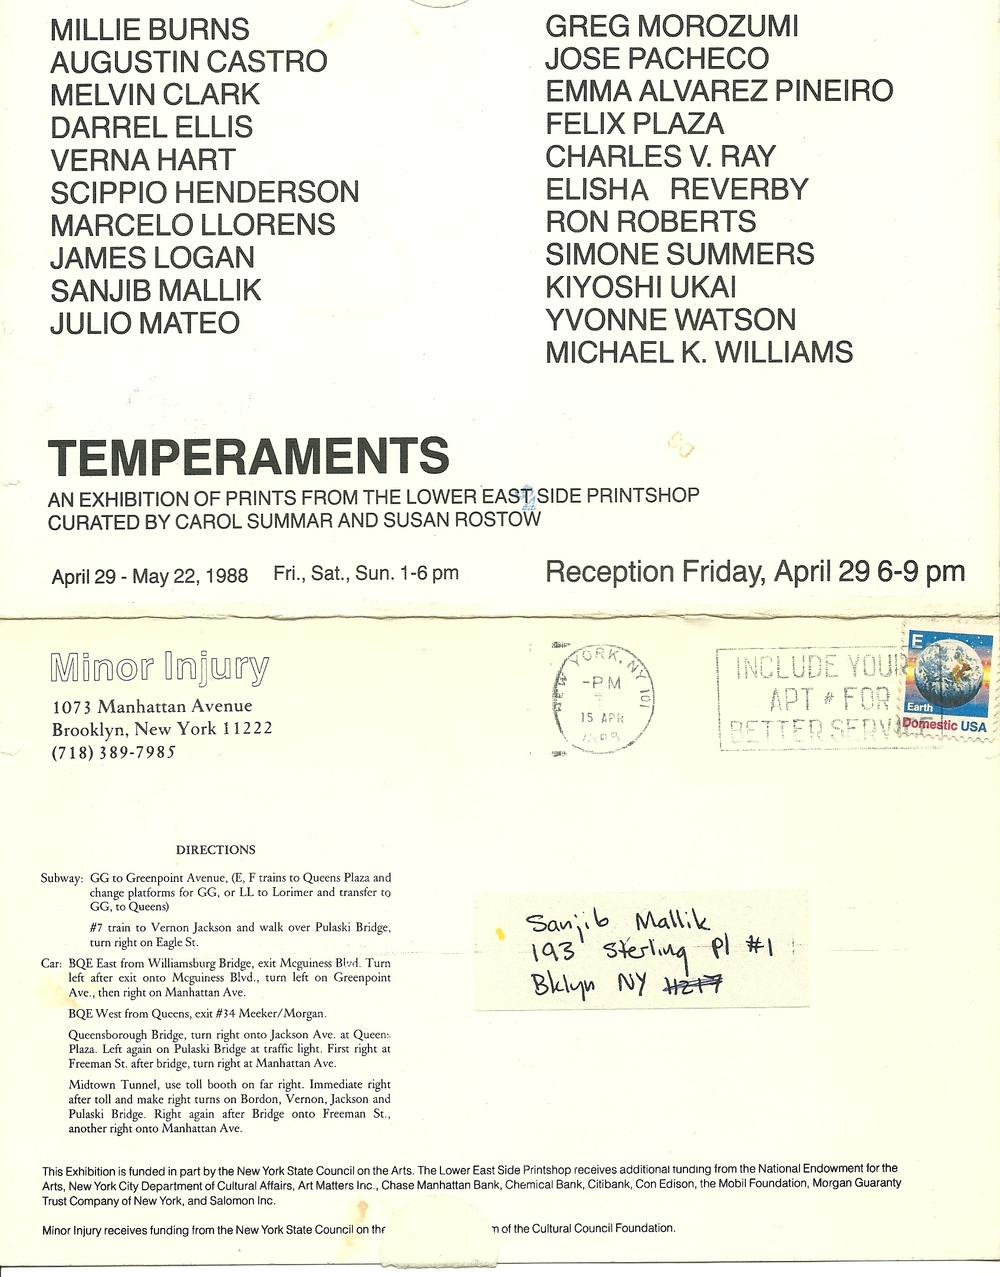 Temperaments 2.jpg